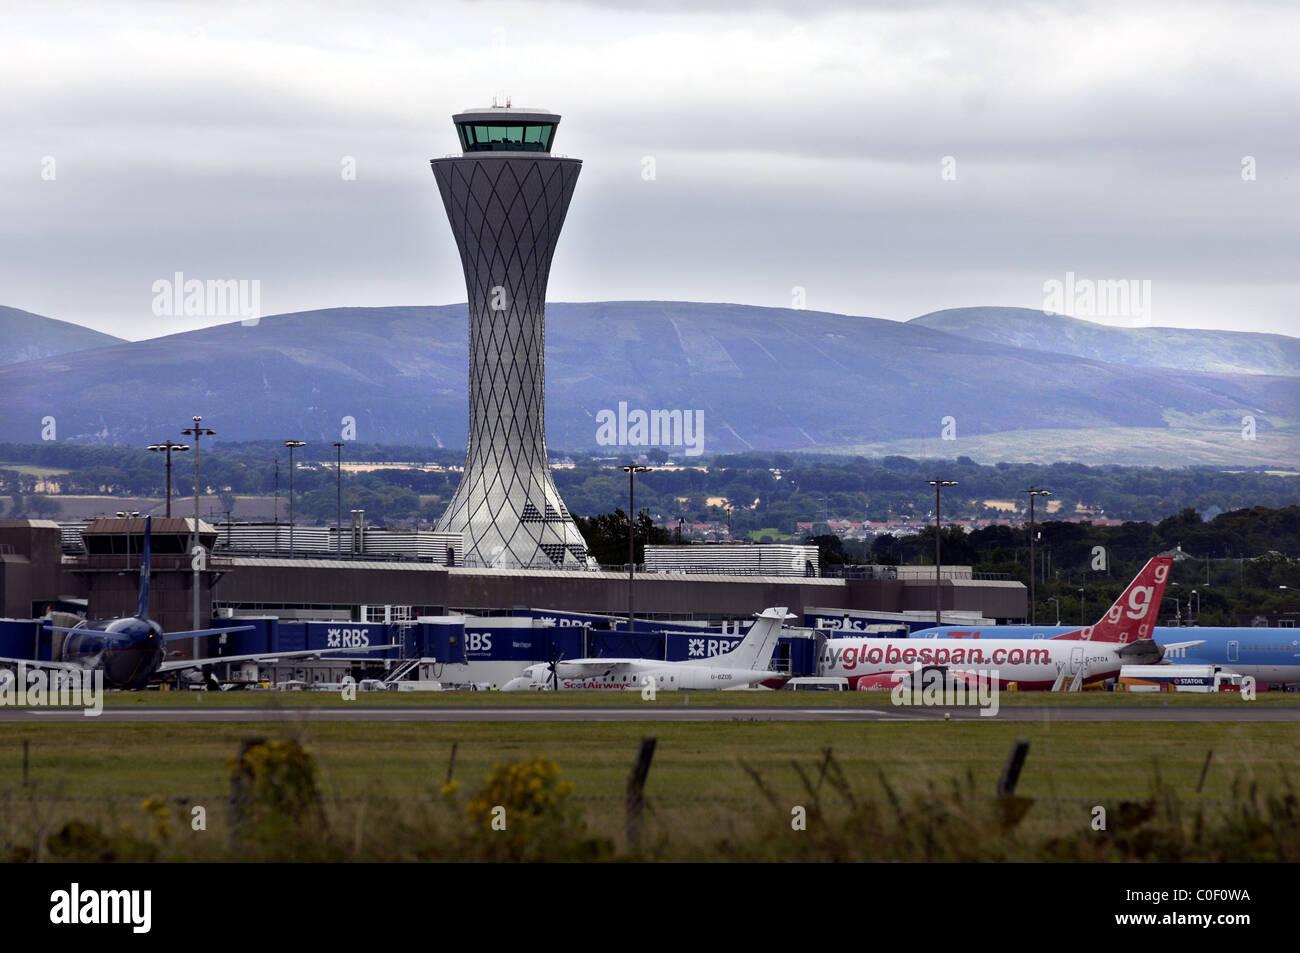 AIR TRAFFIC CONTROL TOWER, EDINBURGH AIRPORT, EDINBURGH, MID LOATHIAN, WITH PLANES ON THE RUNWAY Stock Photo